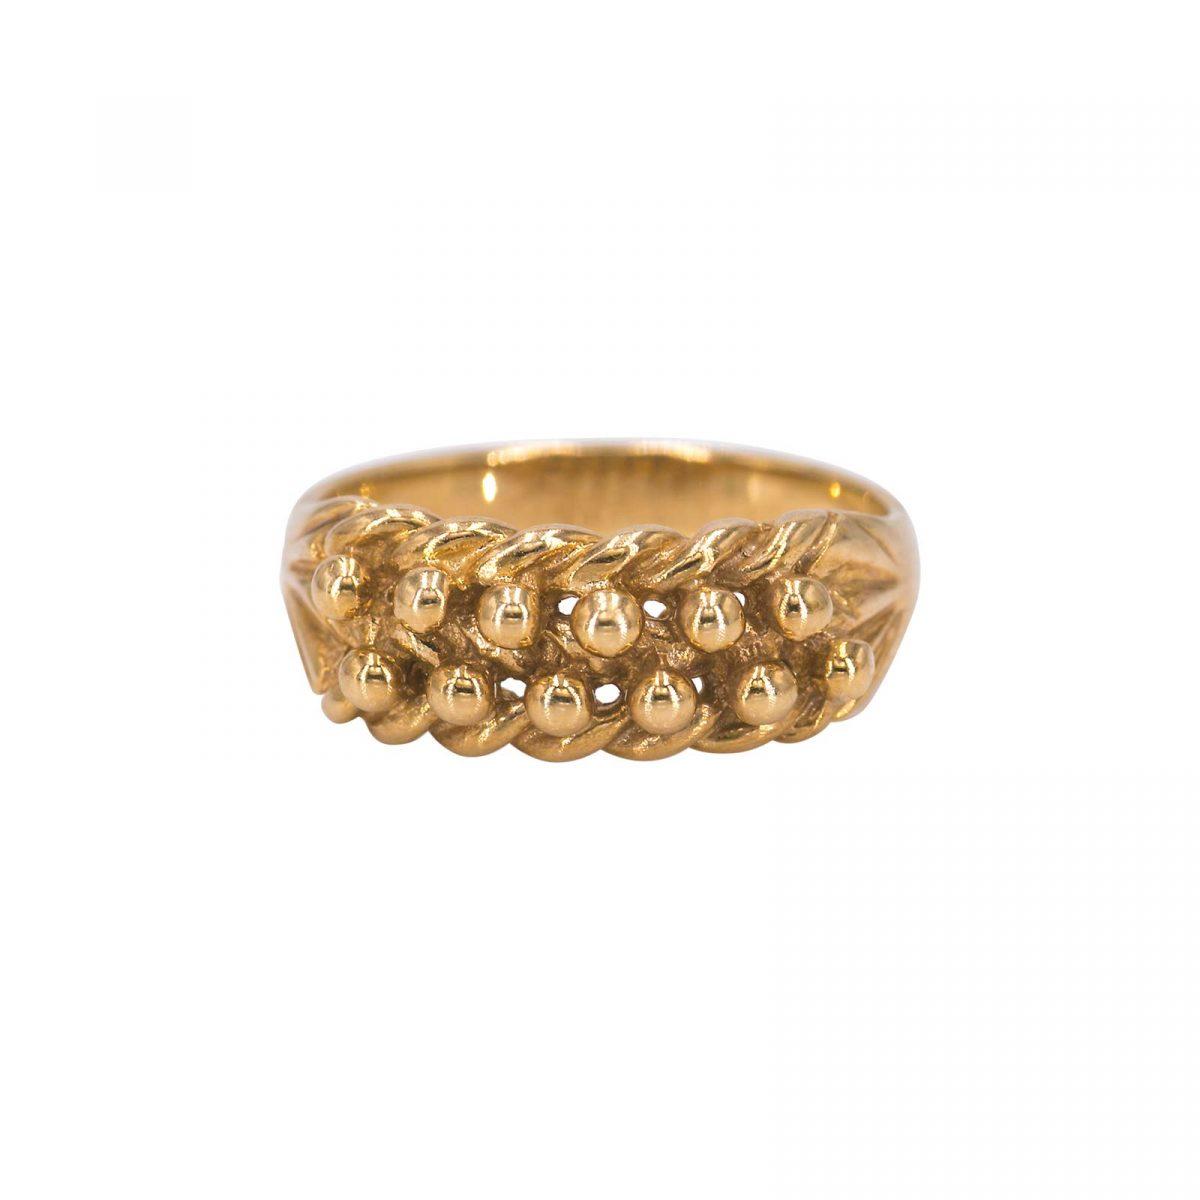 Mens ( unisex) 9 carat yellow gold knot ring